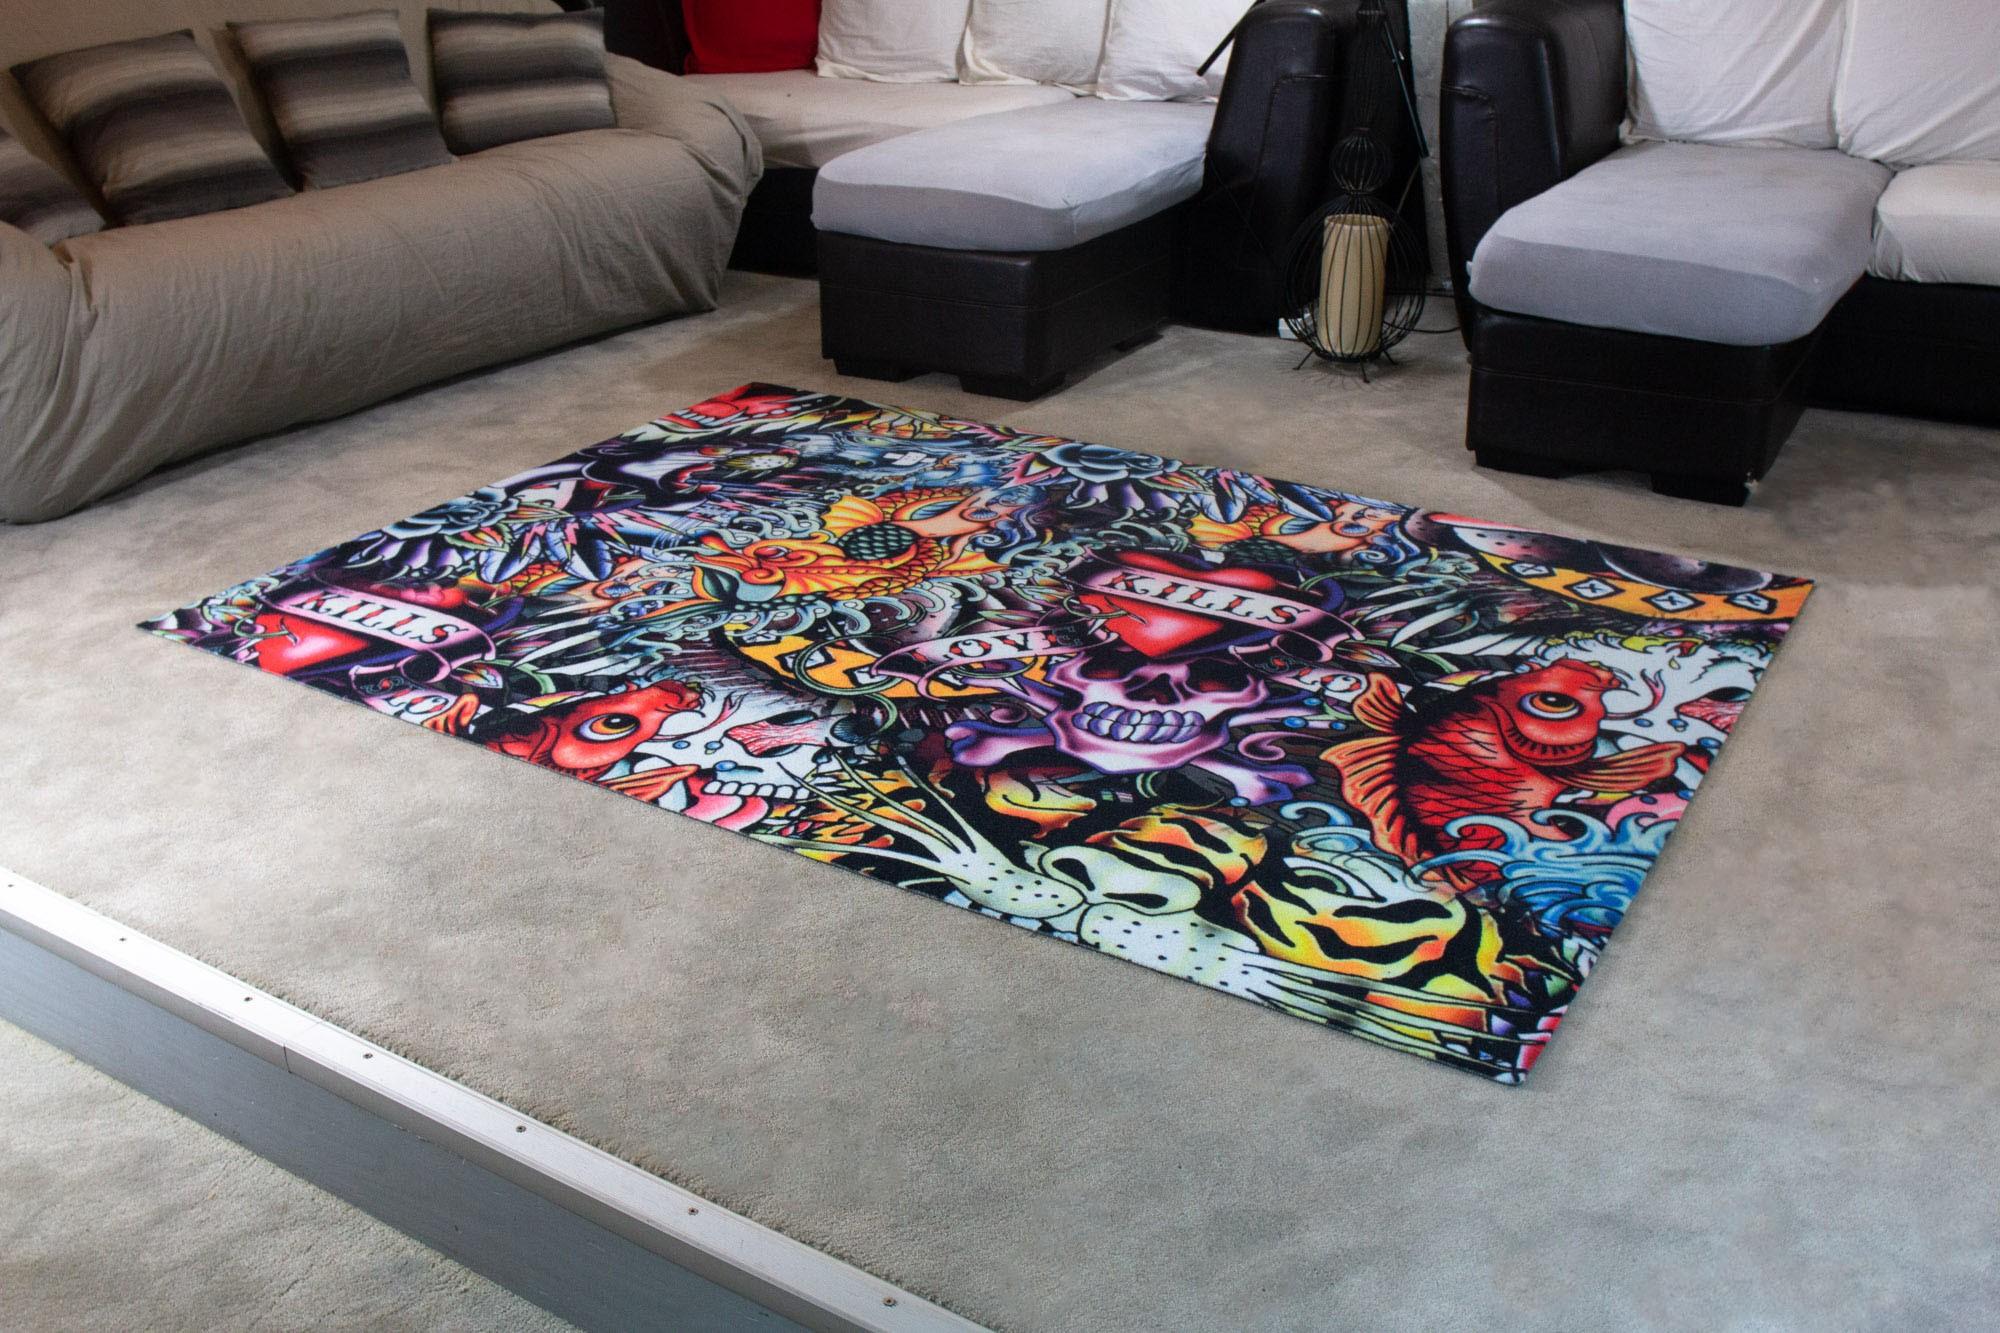 tapis salon moderne tatouage imprime multicolore debonsol